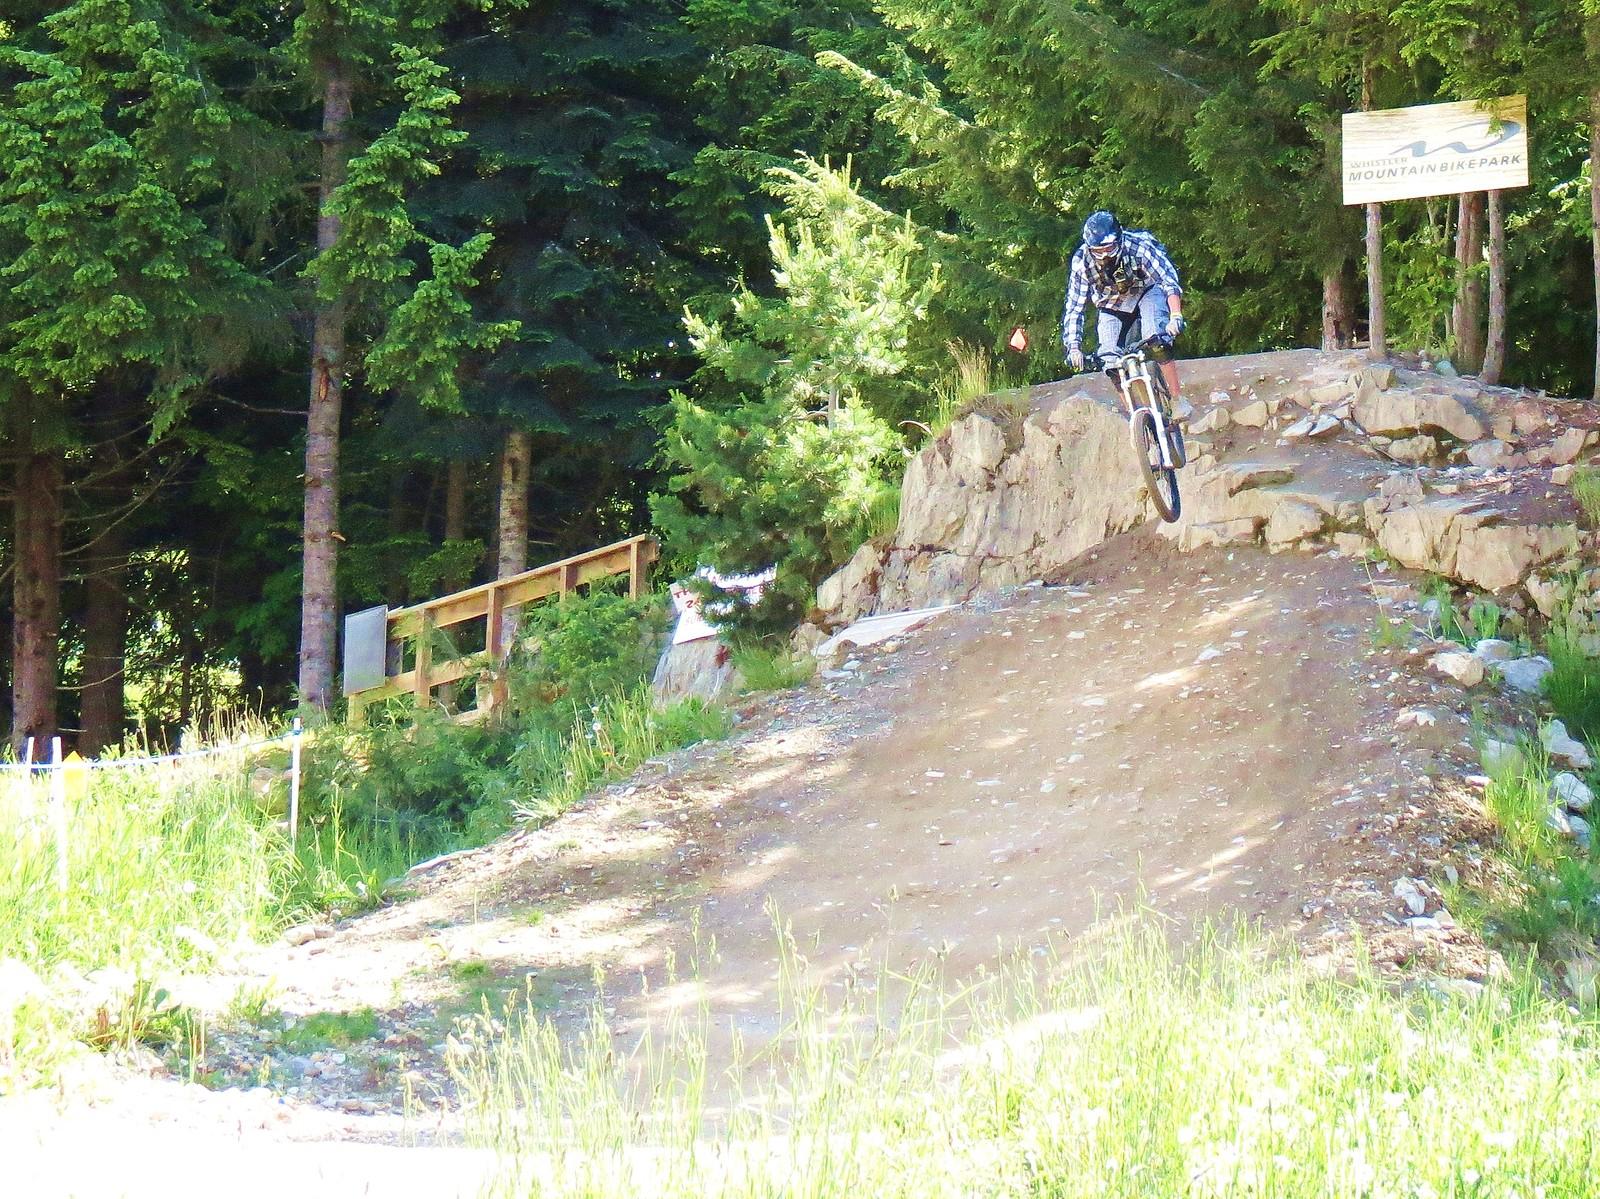 IMG 3533 (2) - Moosey - Mountain Biking Pictures - Vital MTB